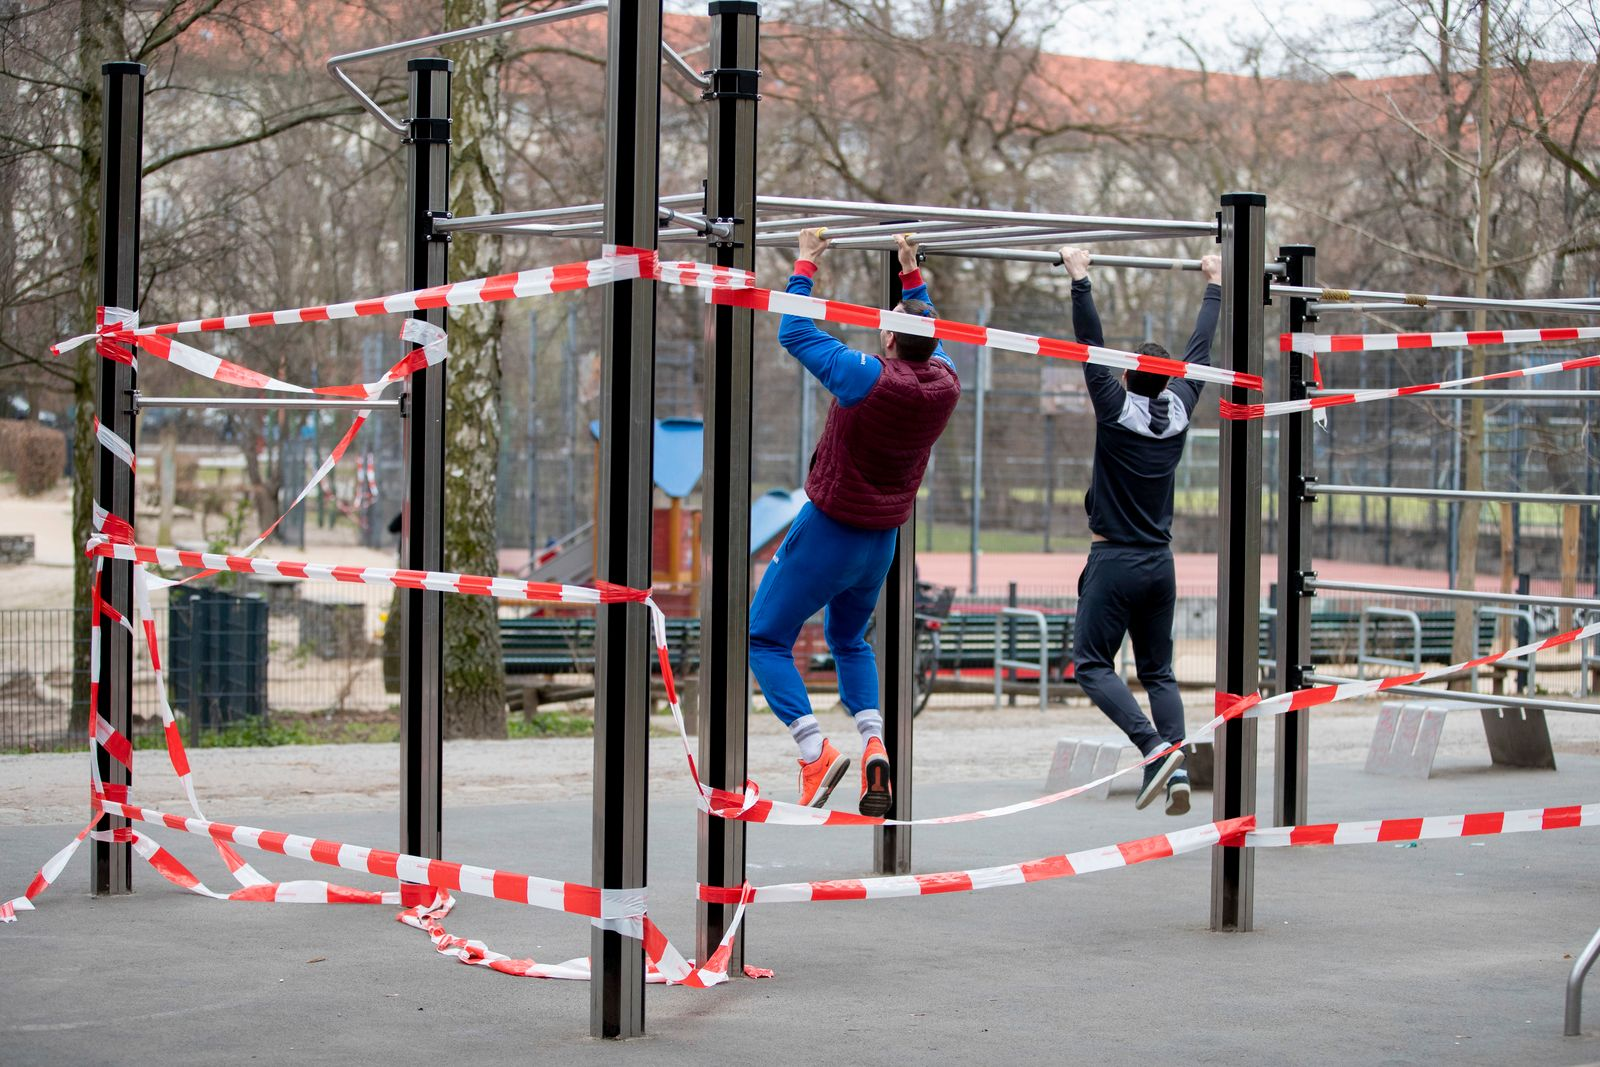 Coronavirus - Fitnessanlage in Berlin